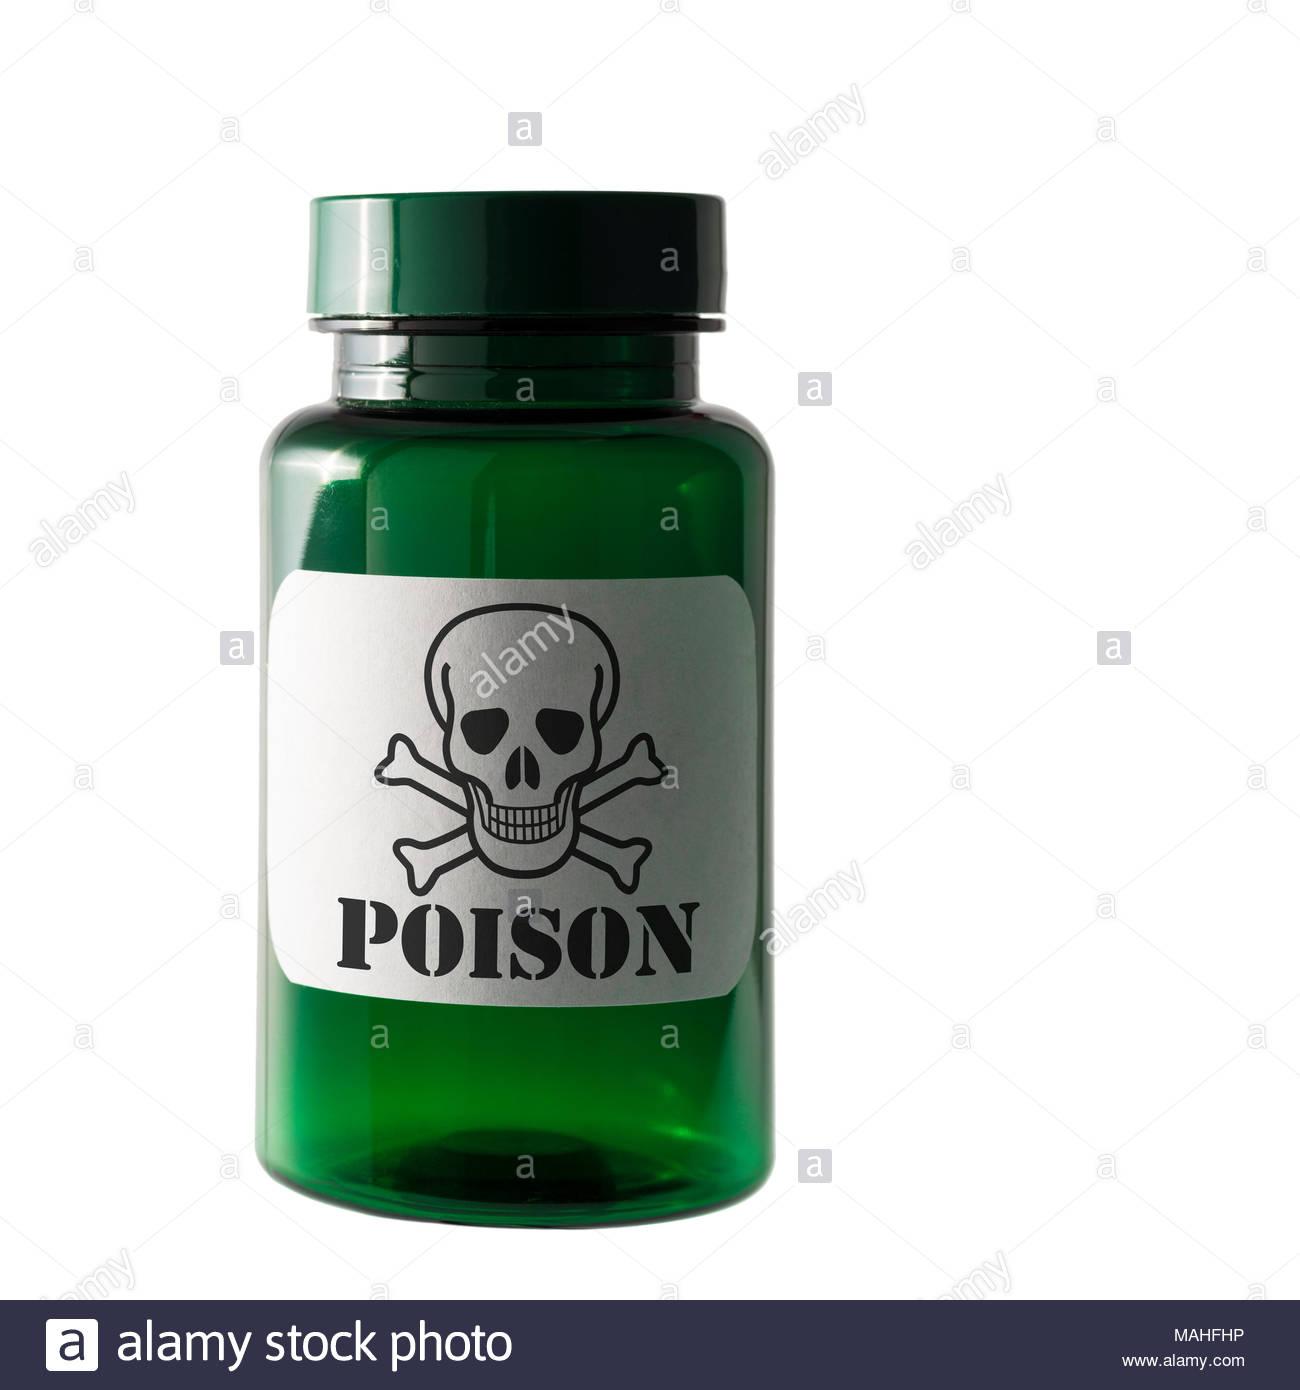 Poison. Dangerous substance label, Dorset, England, UK Stock Photo